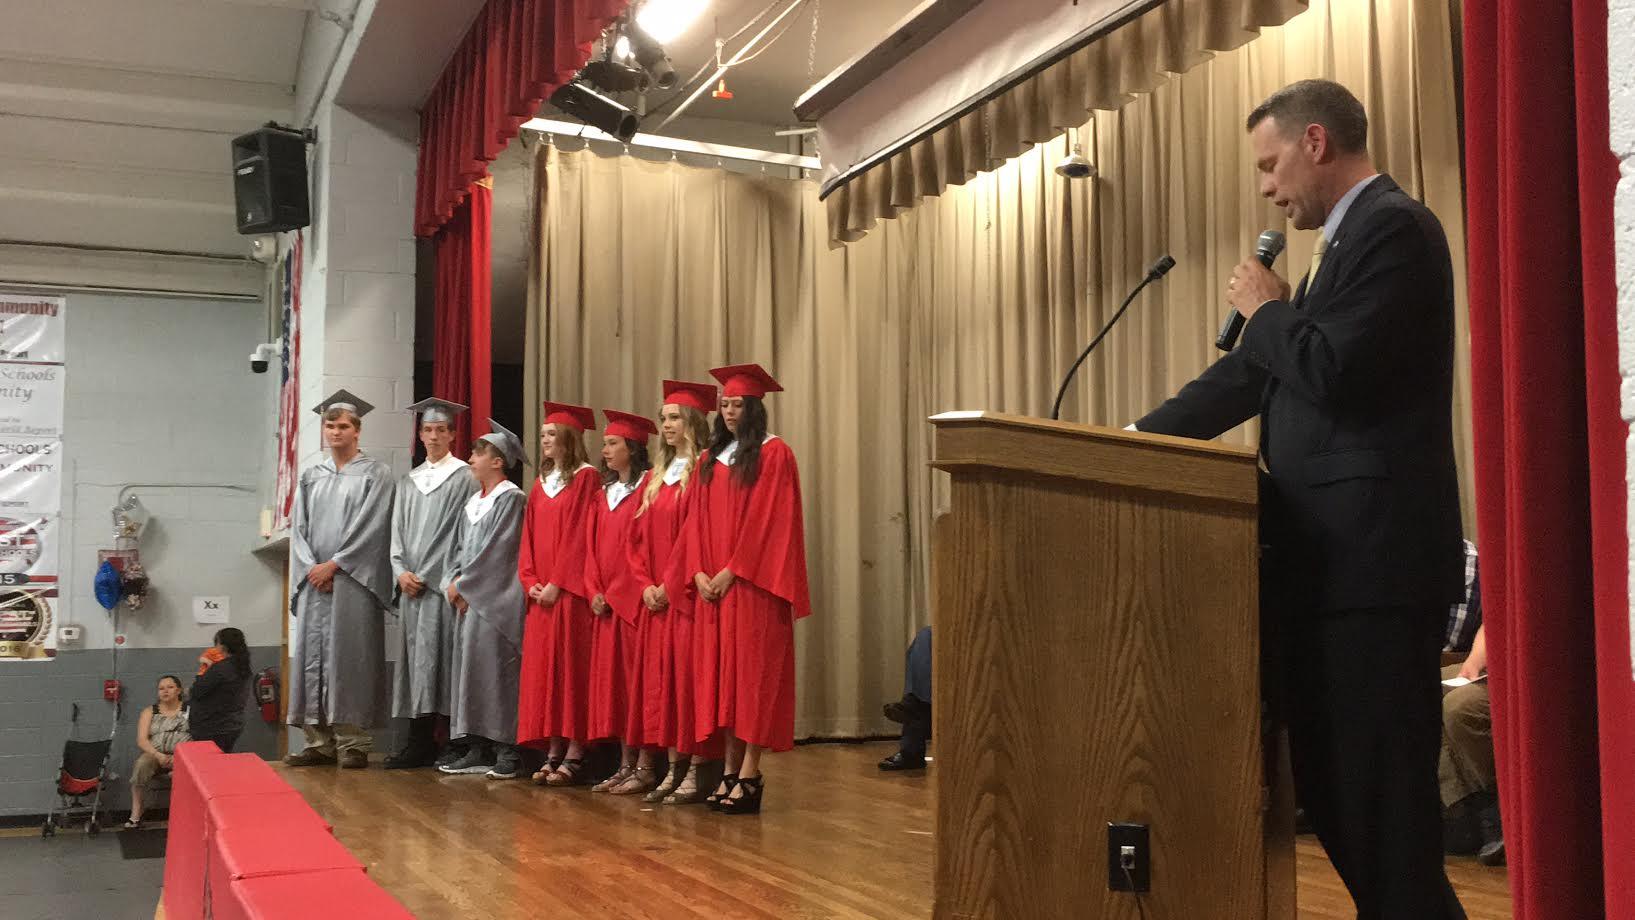 Gresham graduation ceremony held Friday